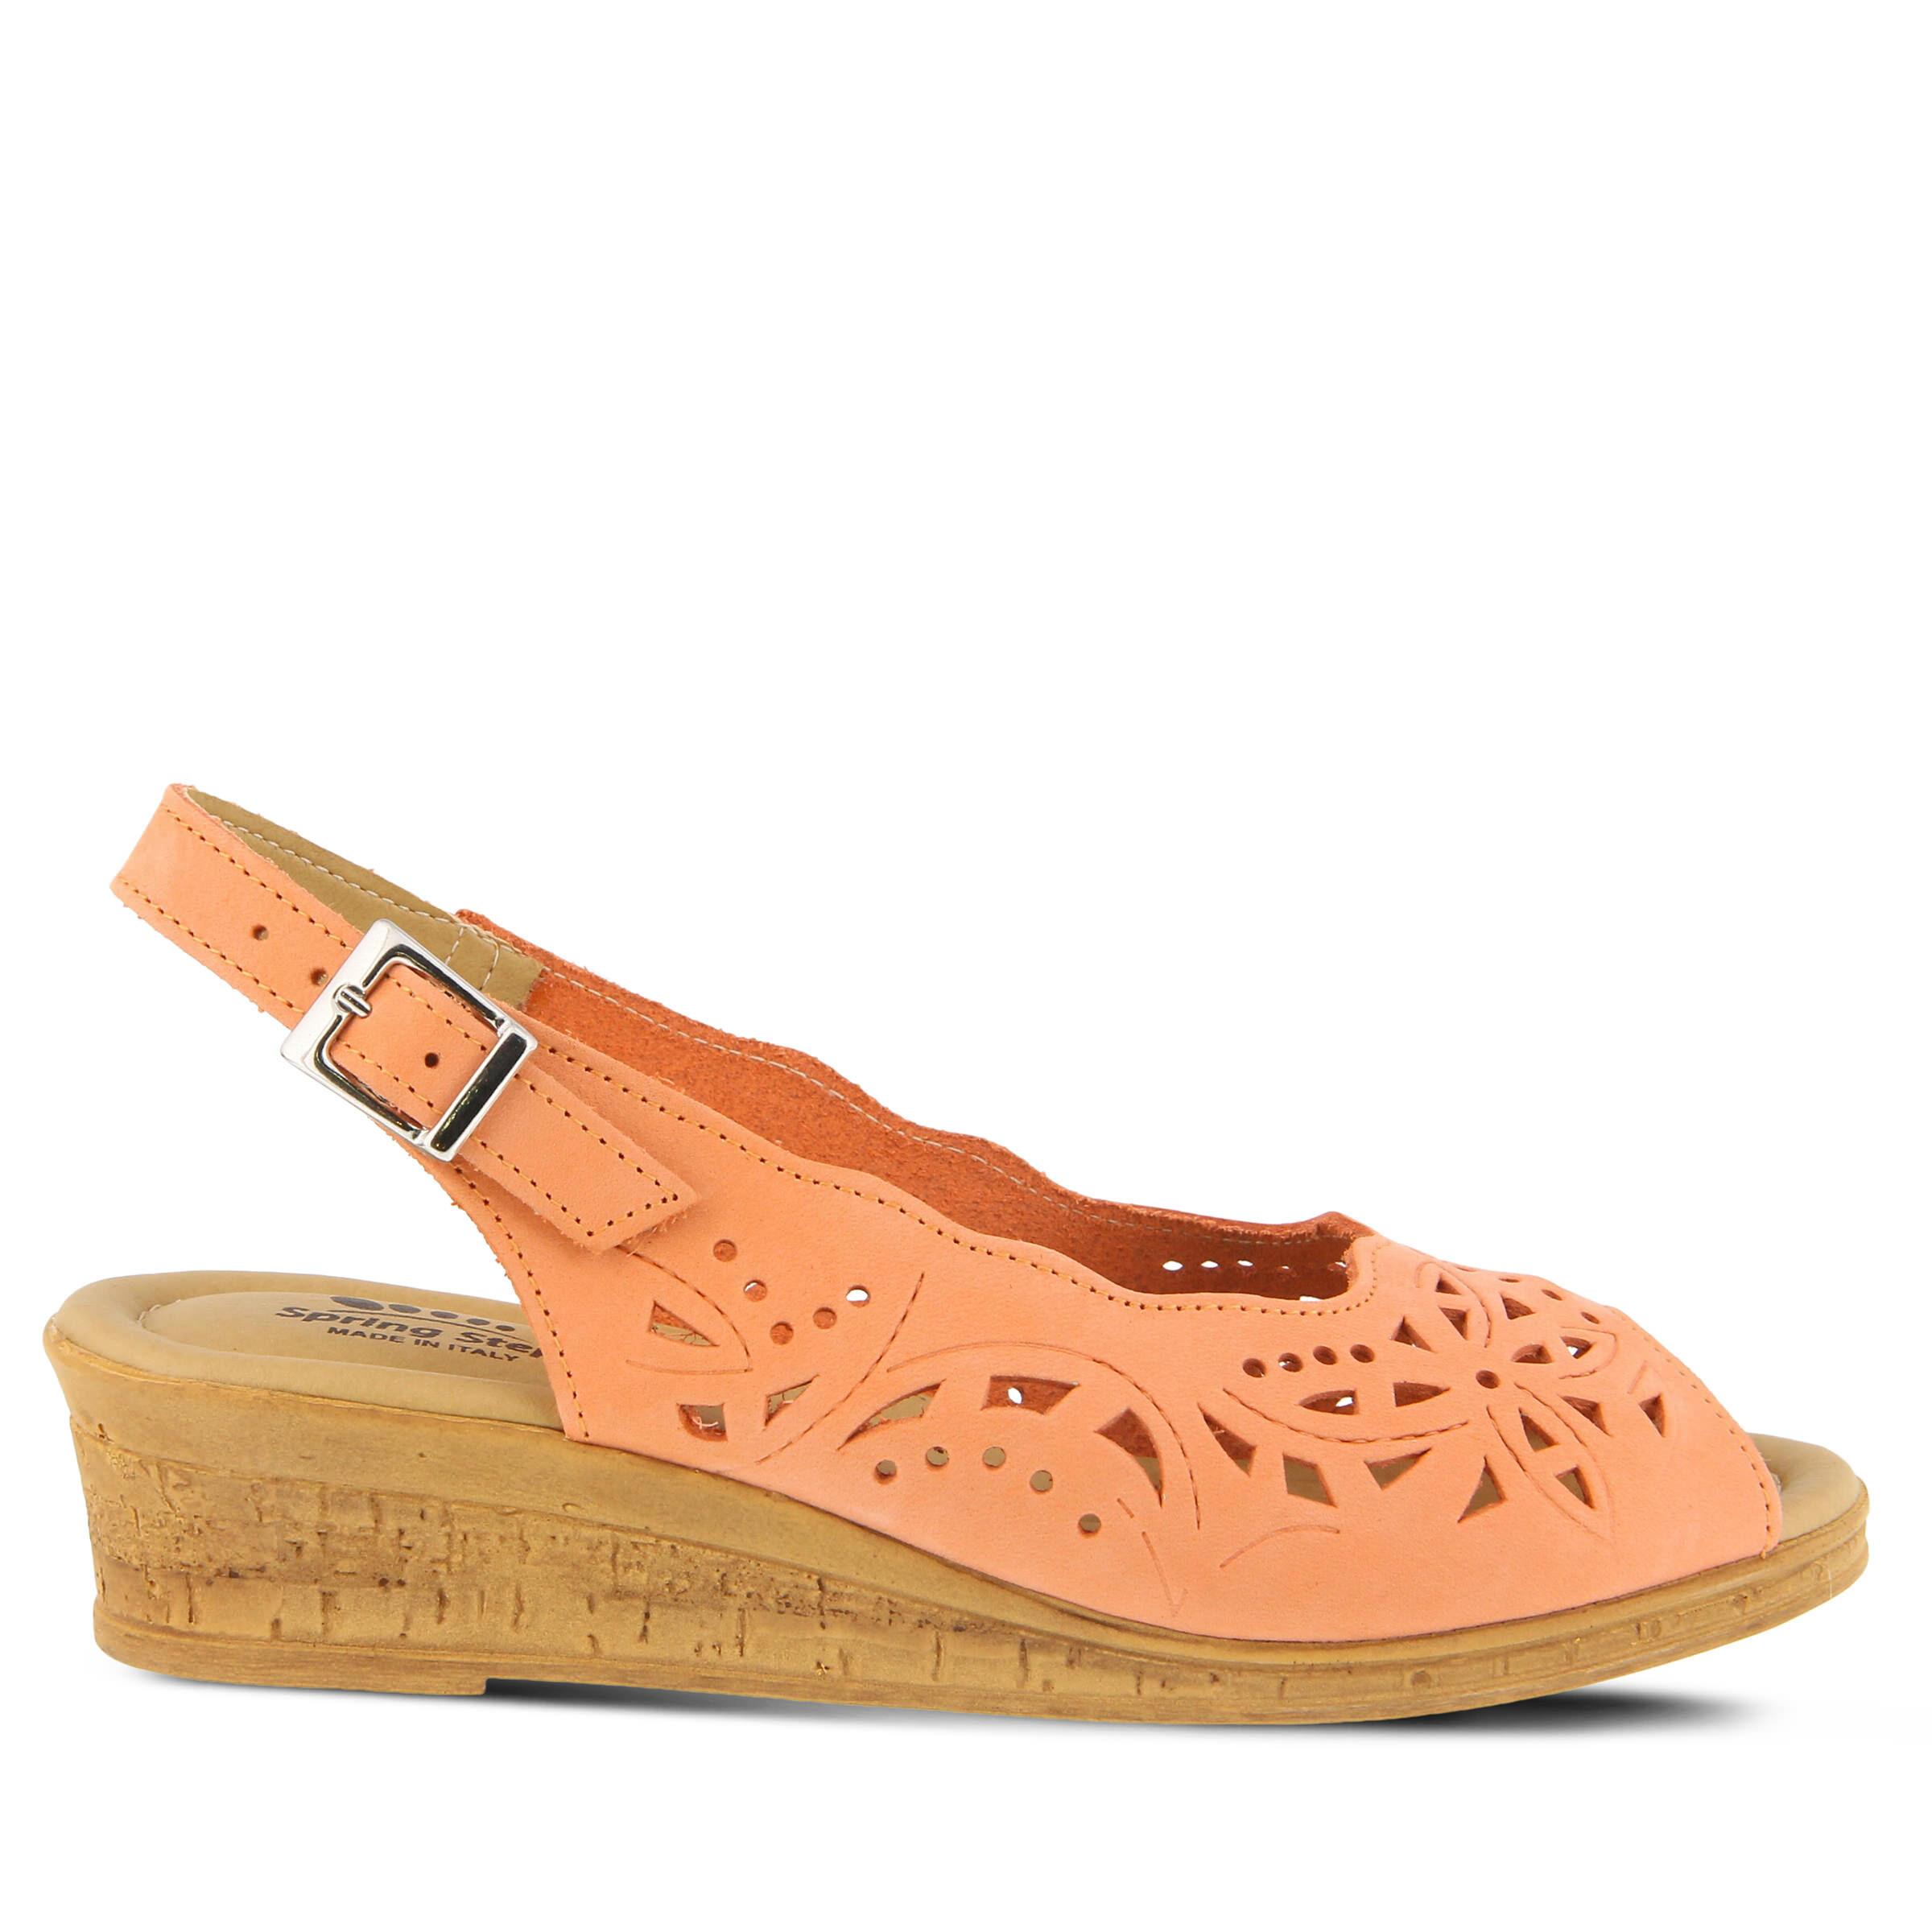 purchase comfortable cheap Women's SPRING STEP Orella Wedge Sandals Peach